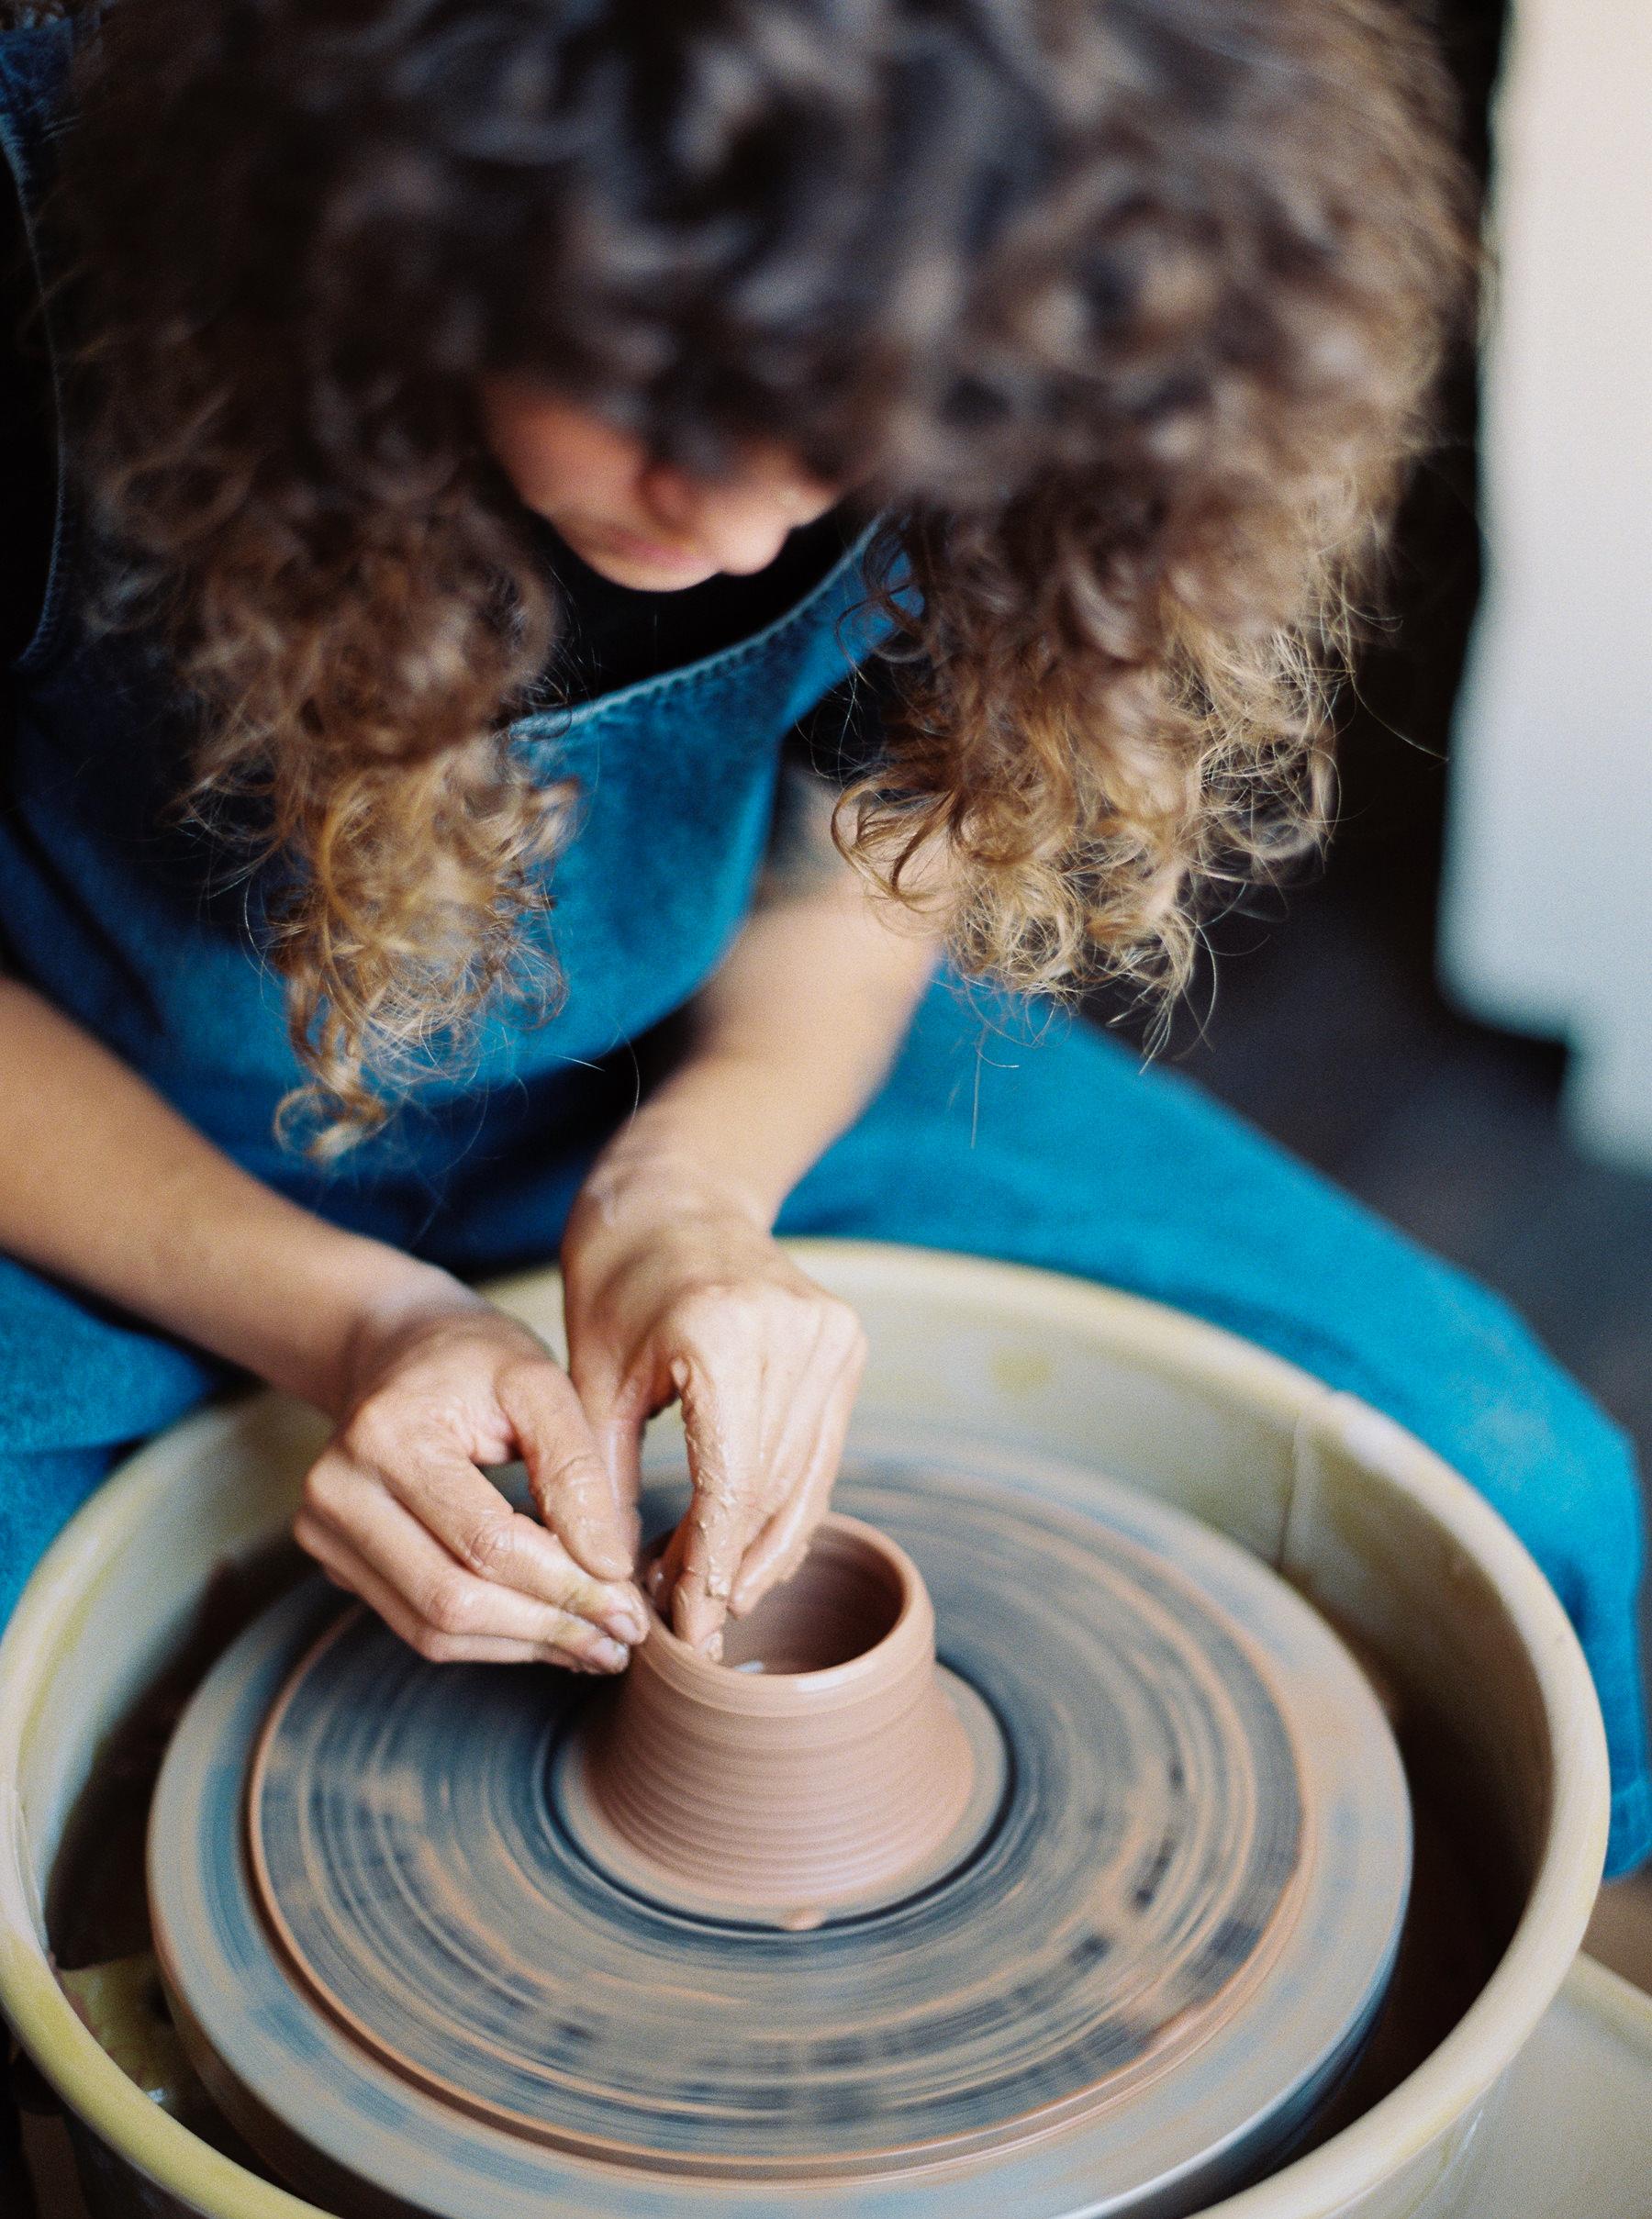 artistprofile-katherinemoes-pottery-annapeters-annapetersphoto-unearthing.tc-10.jpg